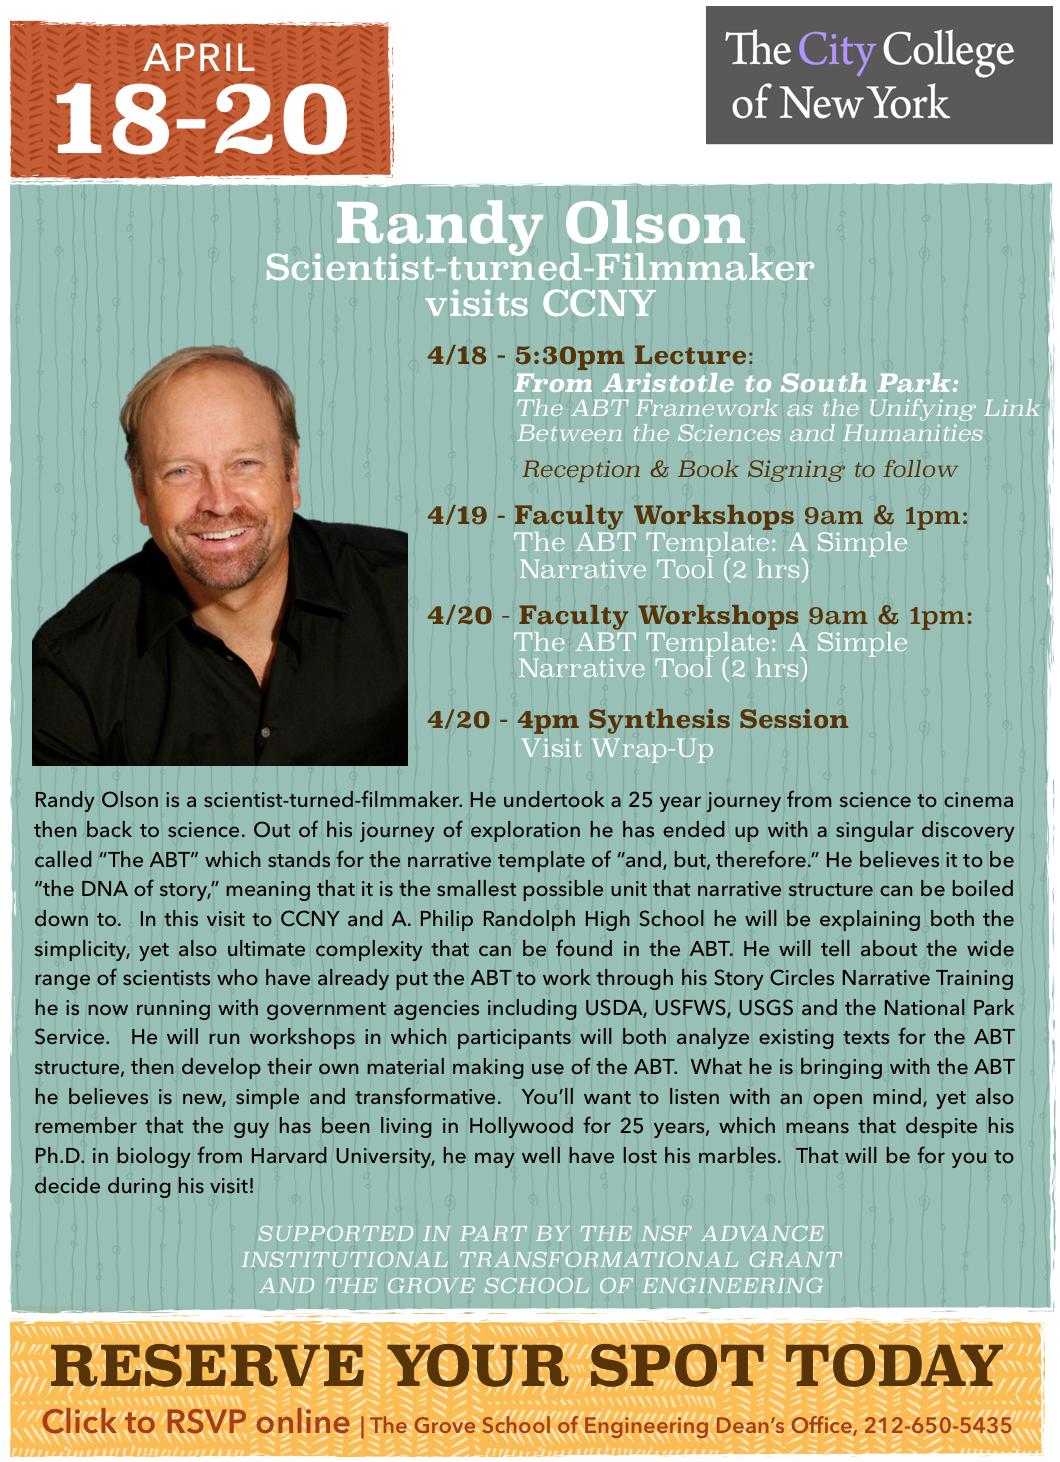 Randy Olson Visits CCNY